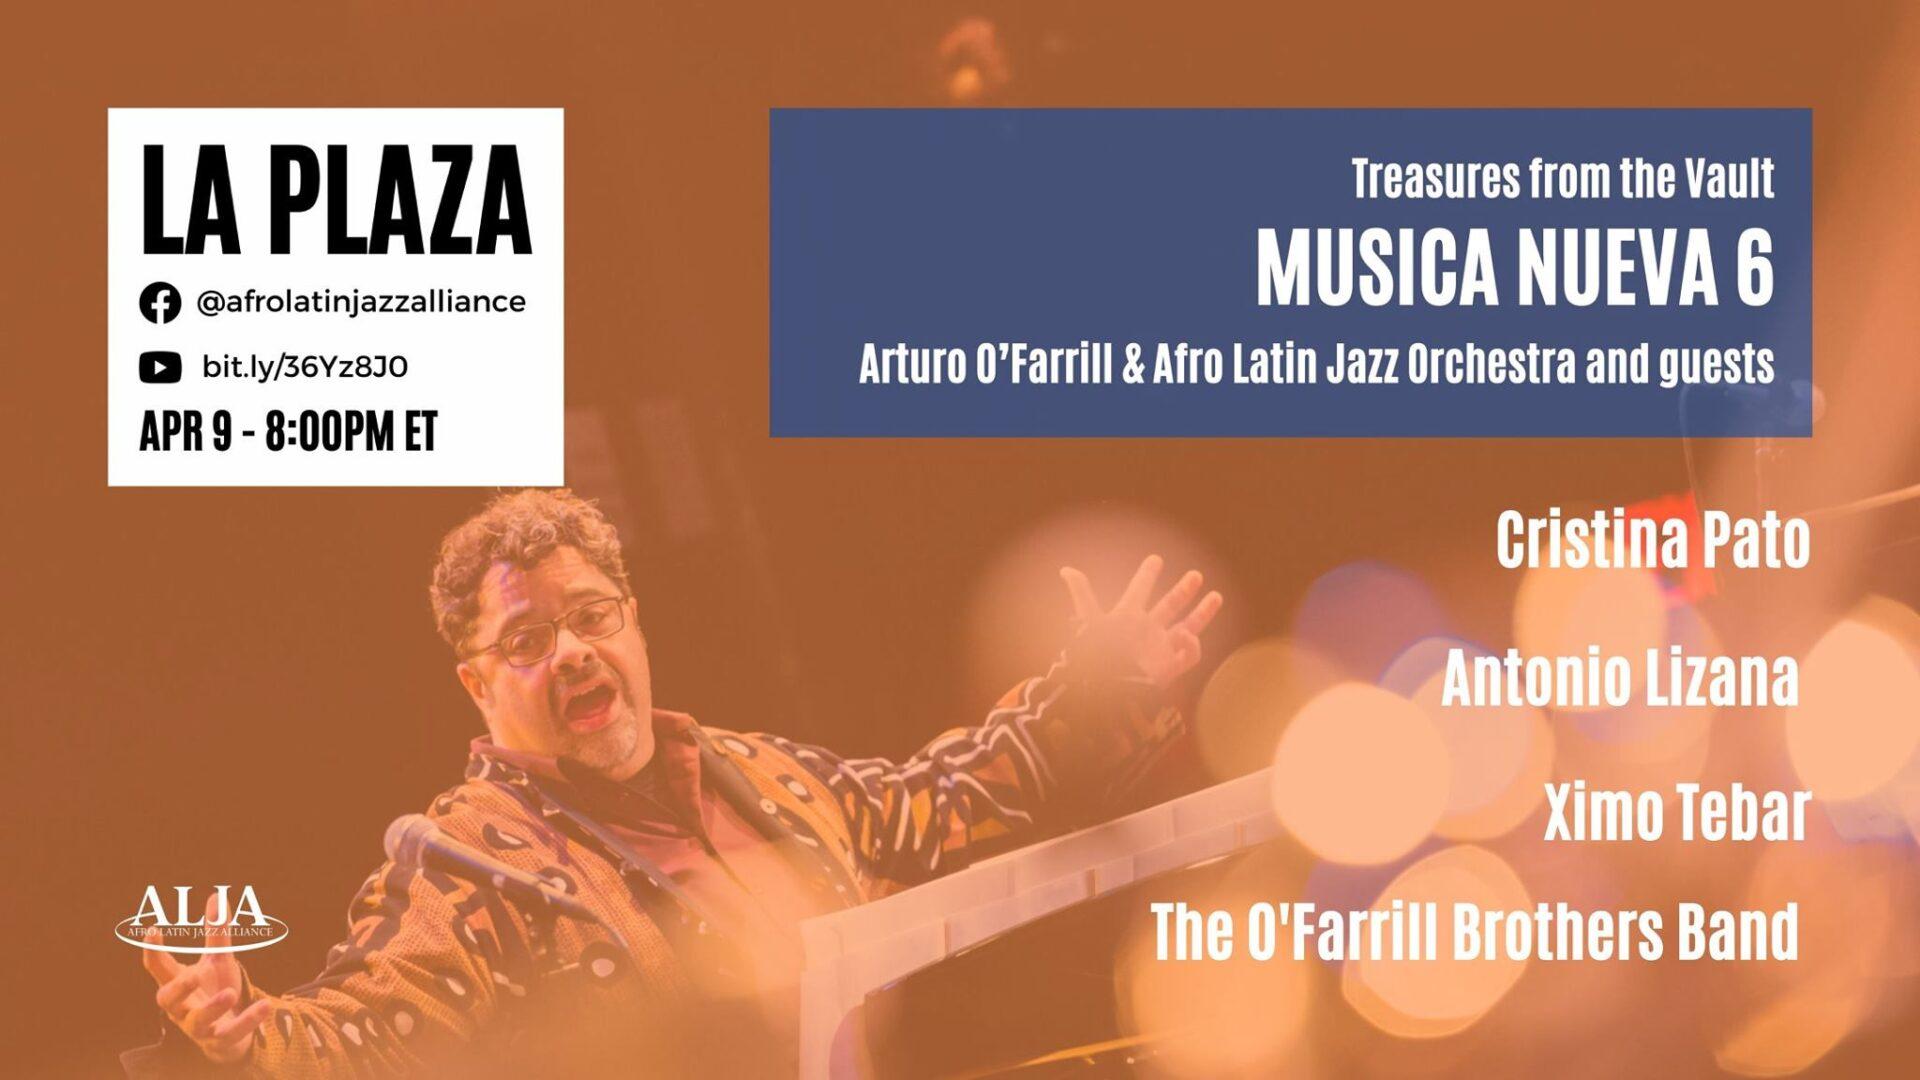 La Plaza @ Digital VillageMúsica Nueva 6Arturo O'Farrill + Afro Latin Jazz Orchestra + FriendsFRIDAY, APRIL 9, 2021 @ 8:00 pm EST | 7:00 pm CST | 5:00 pm PST